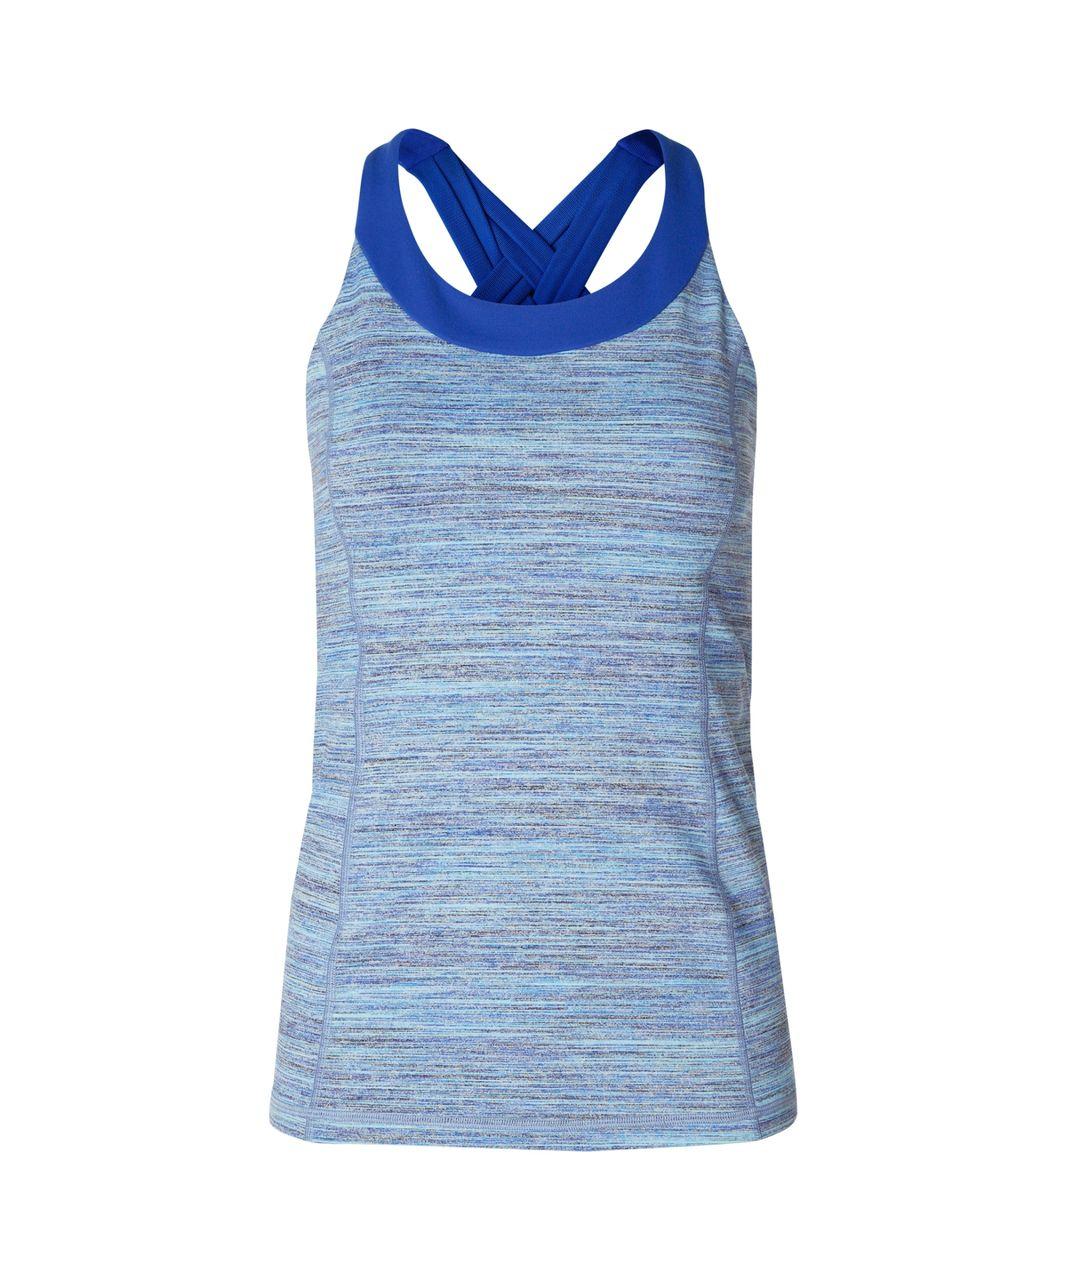 Lululemon Enhearten Tank - Space Dye Camo Caspian Blue Sapphire Blue / Sapphire Blue